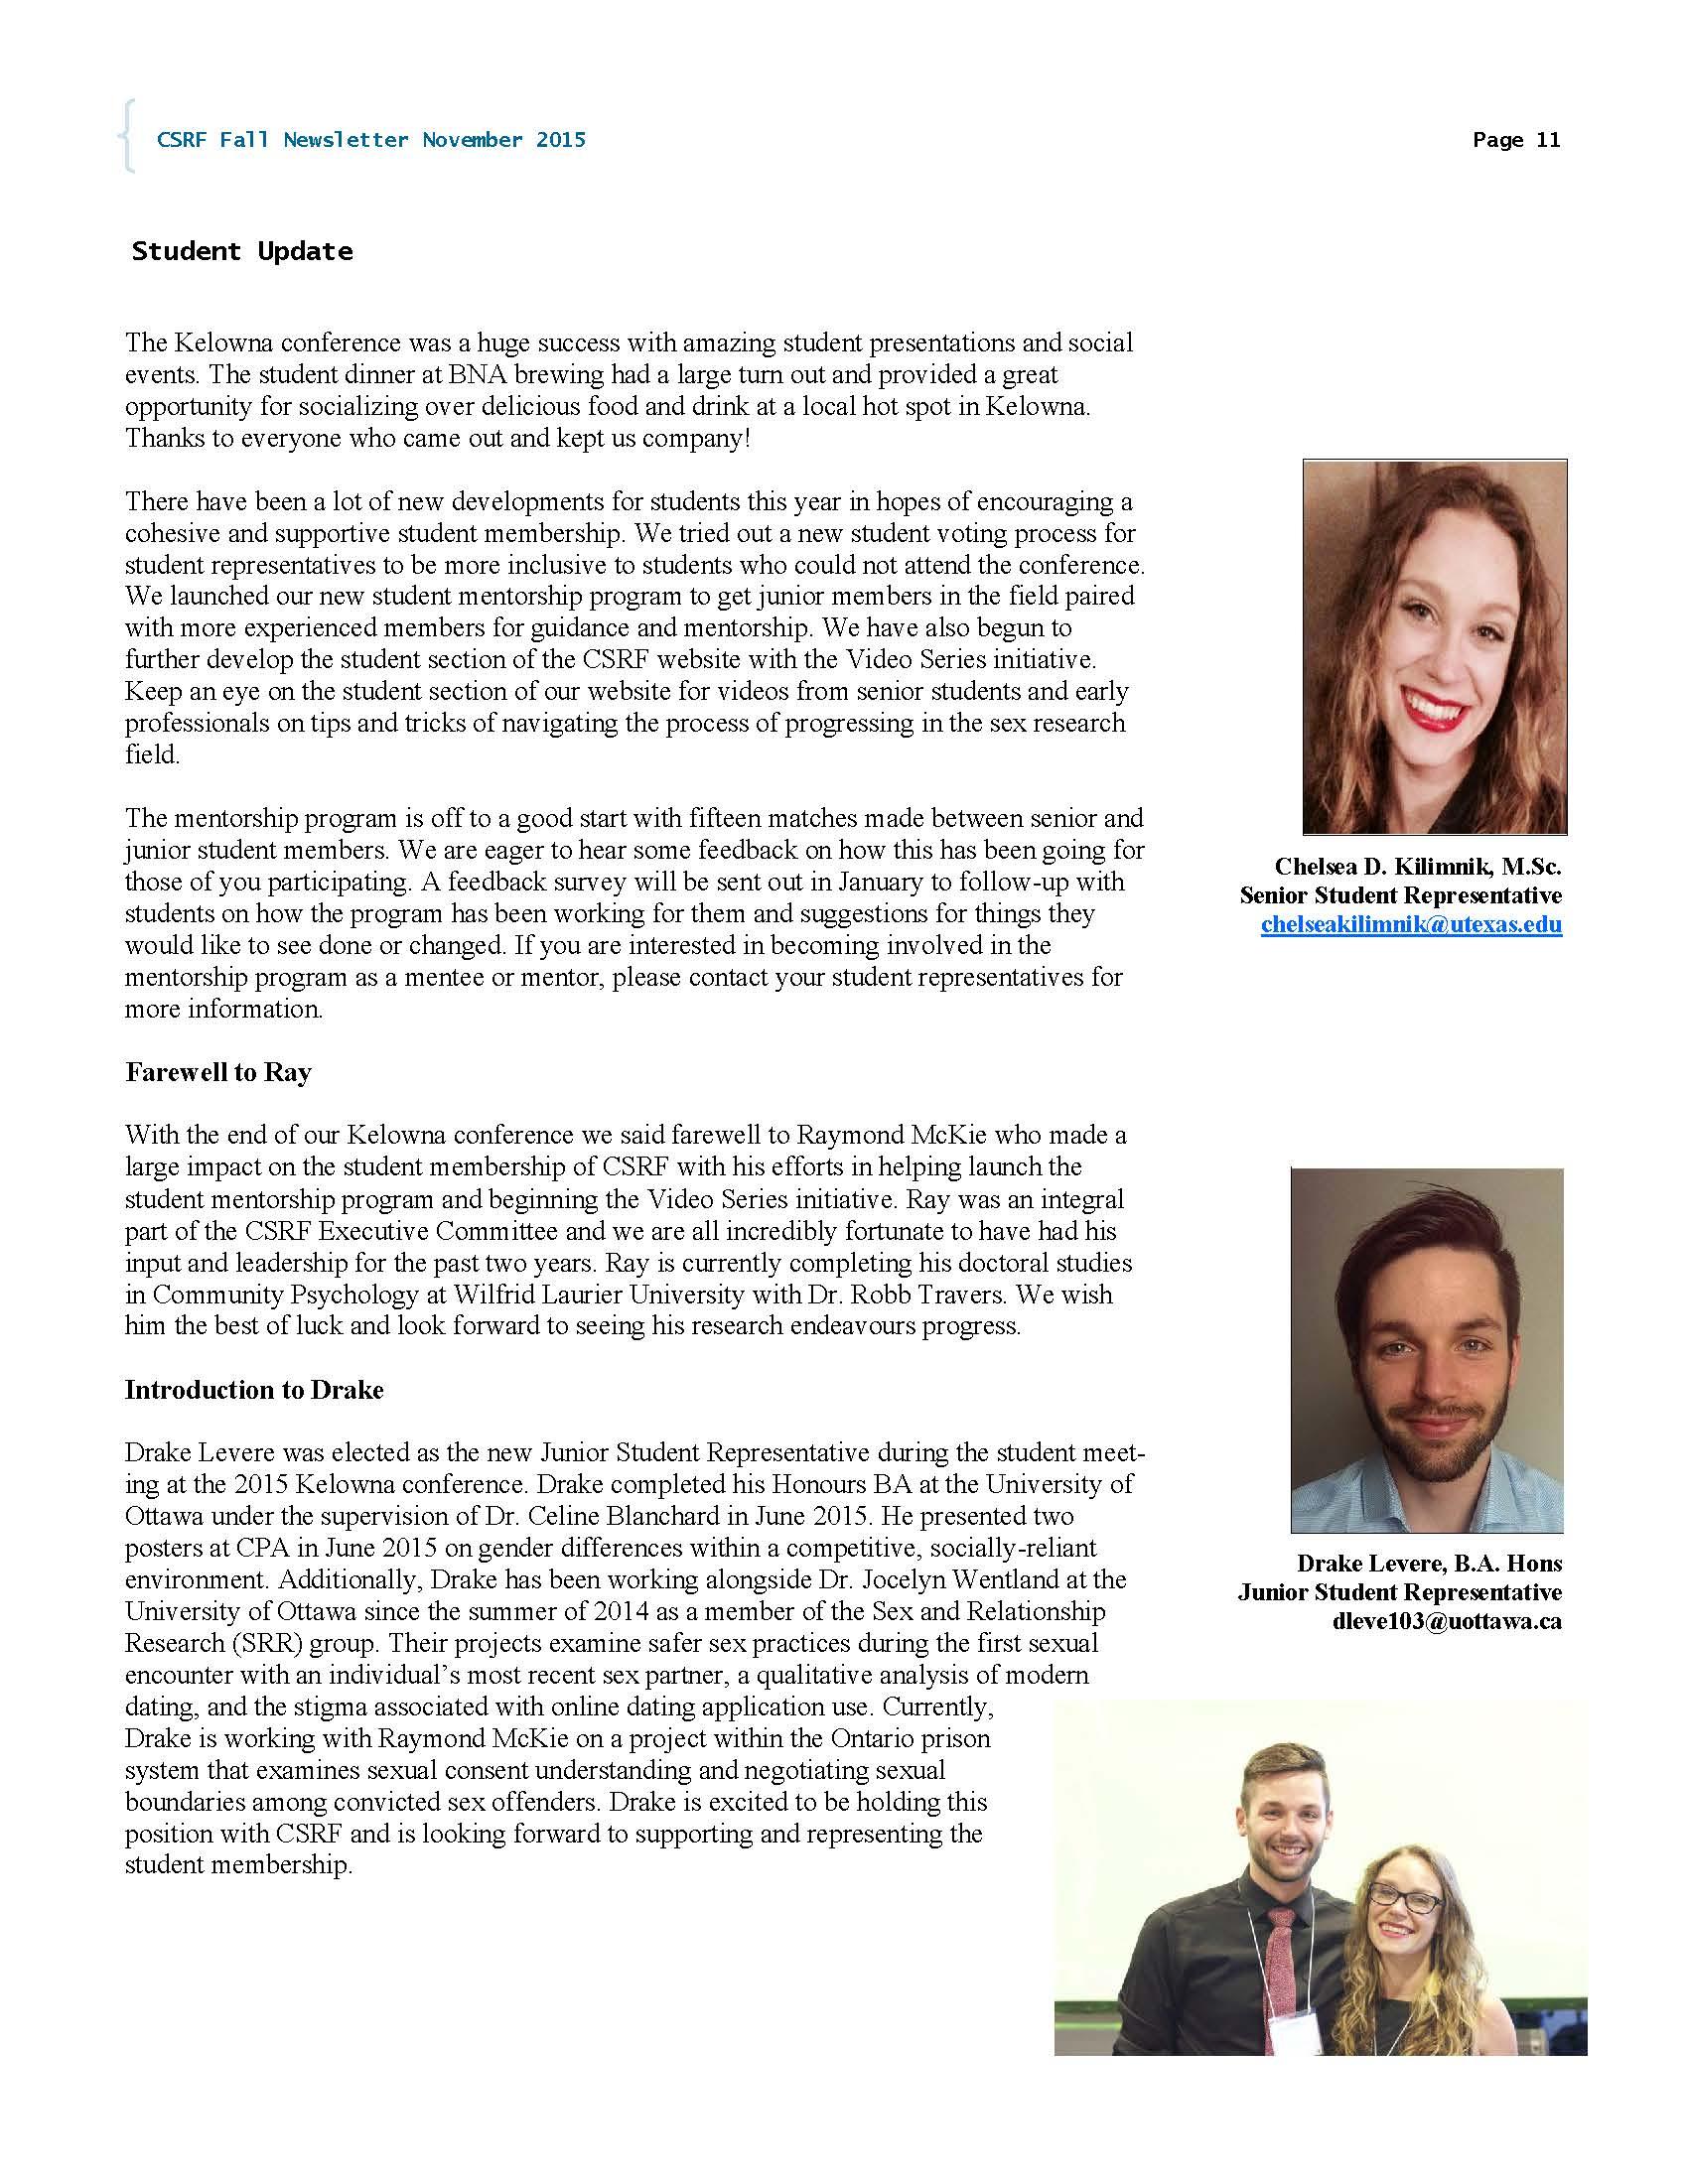 CSRF Fall Newsletter 2015_Page_11.jpg